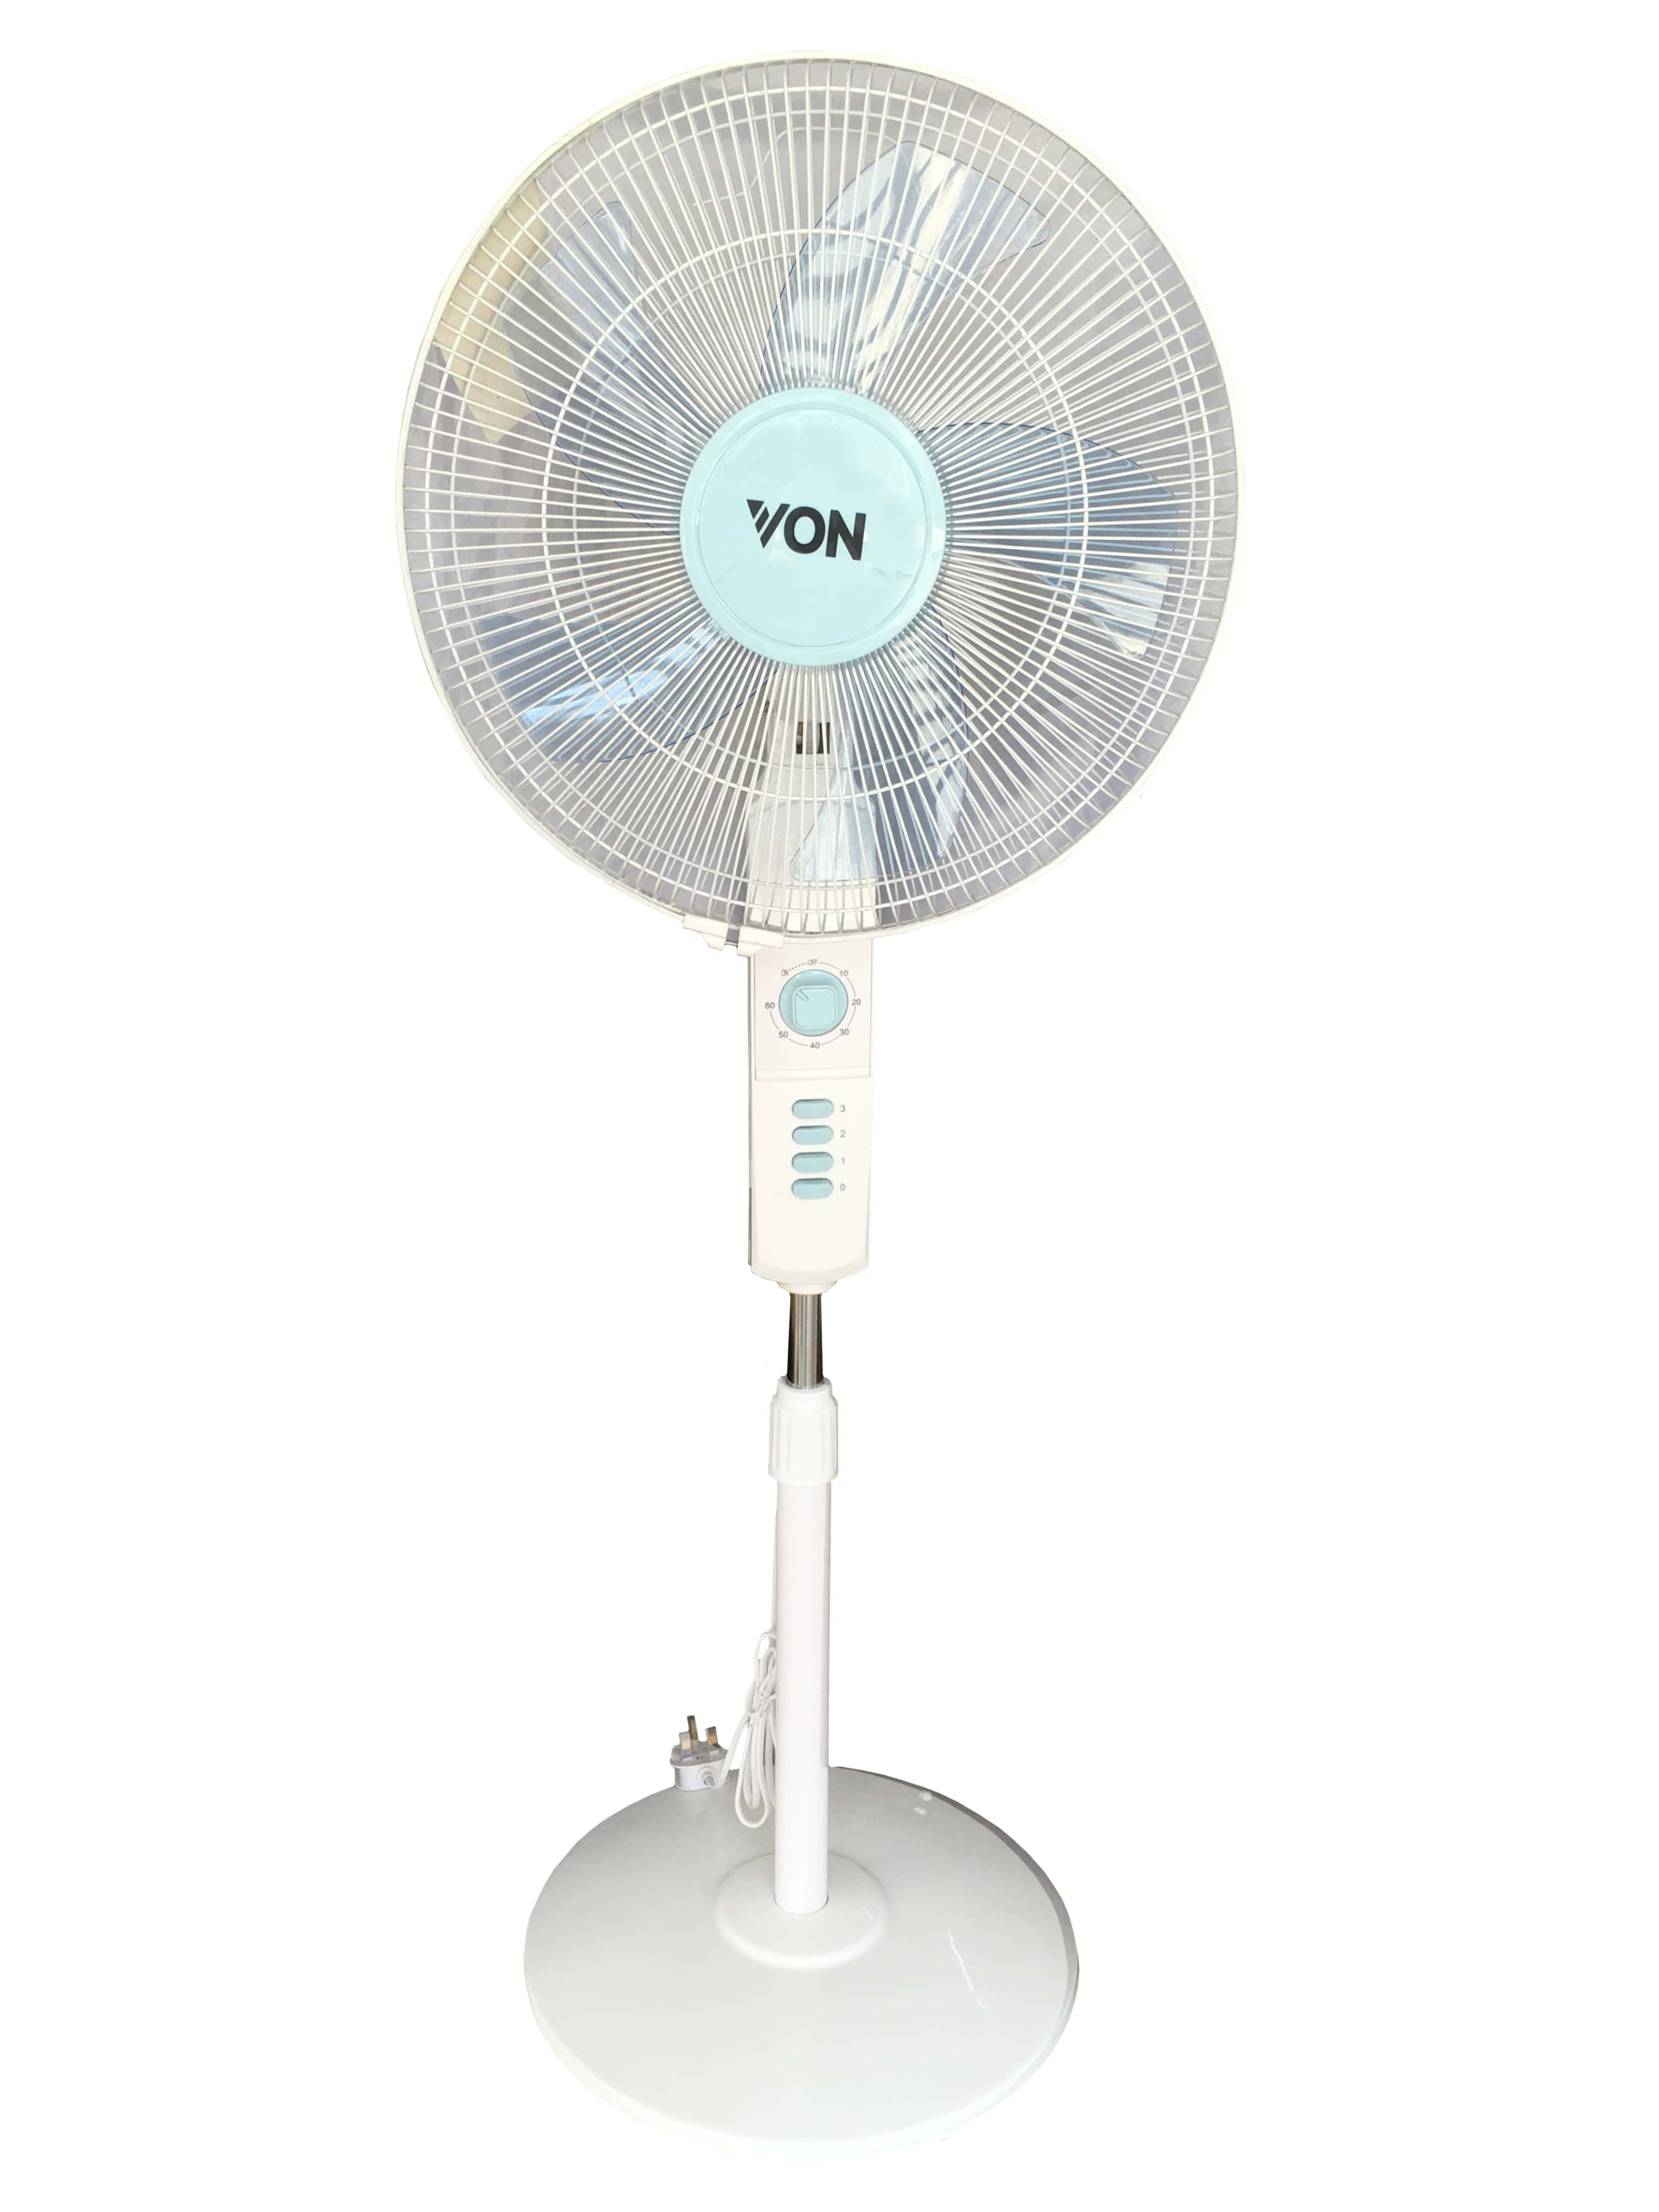 "Von Hotpoint Floor Standing Fan 16"" inch Tanzania (White, VSNJ6620L)"